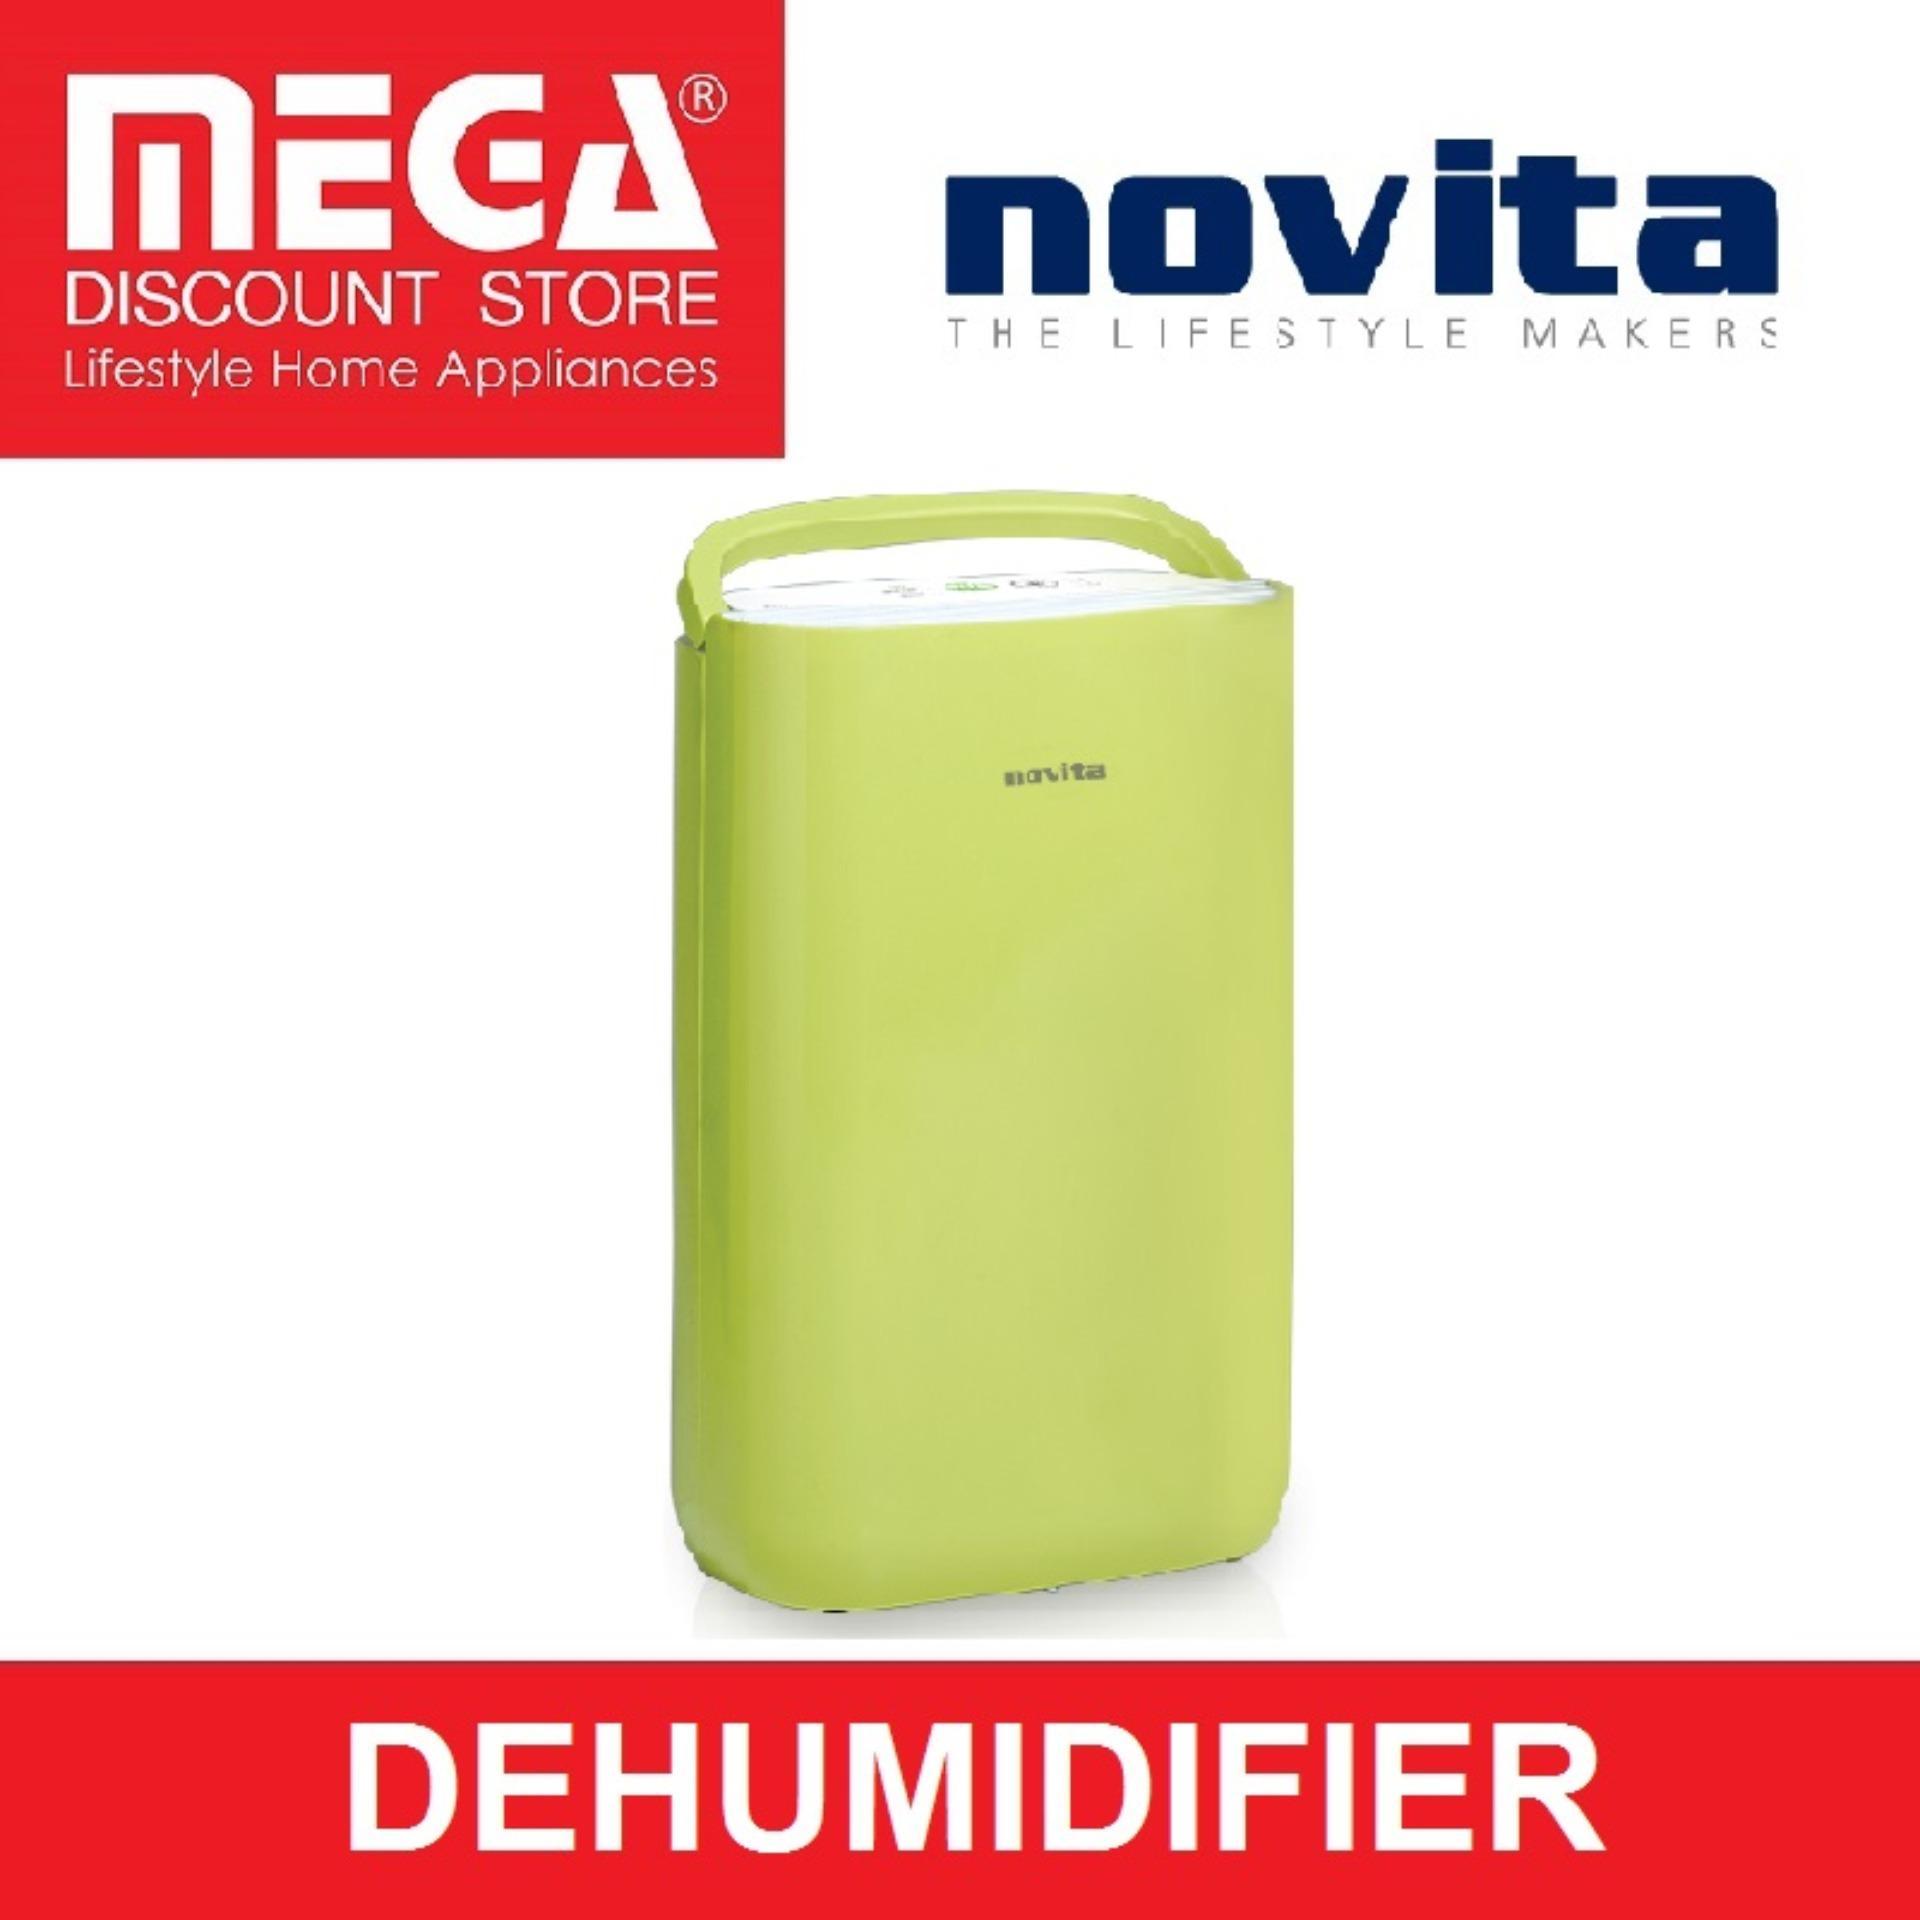 Cooling And Heating Hitachi Air Purifier Ep A3000 W Novita Dehumidifier Nd3155 Green